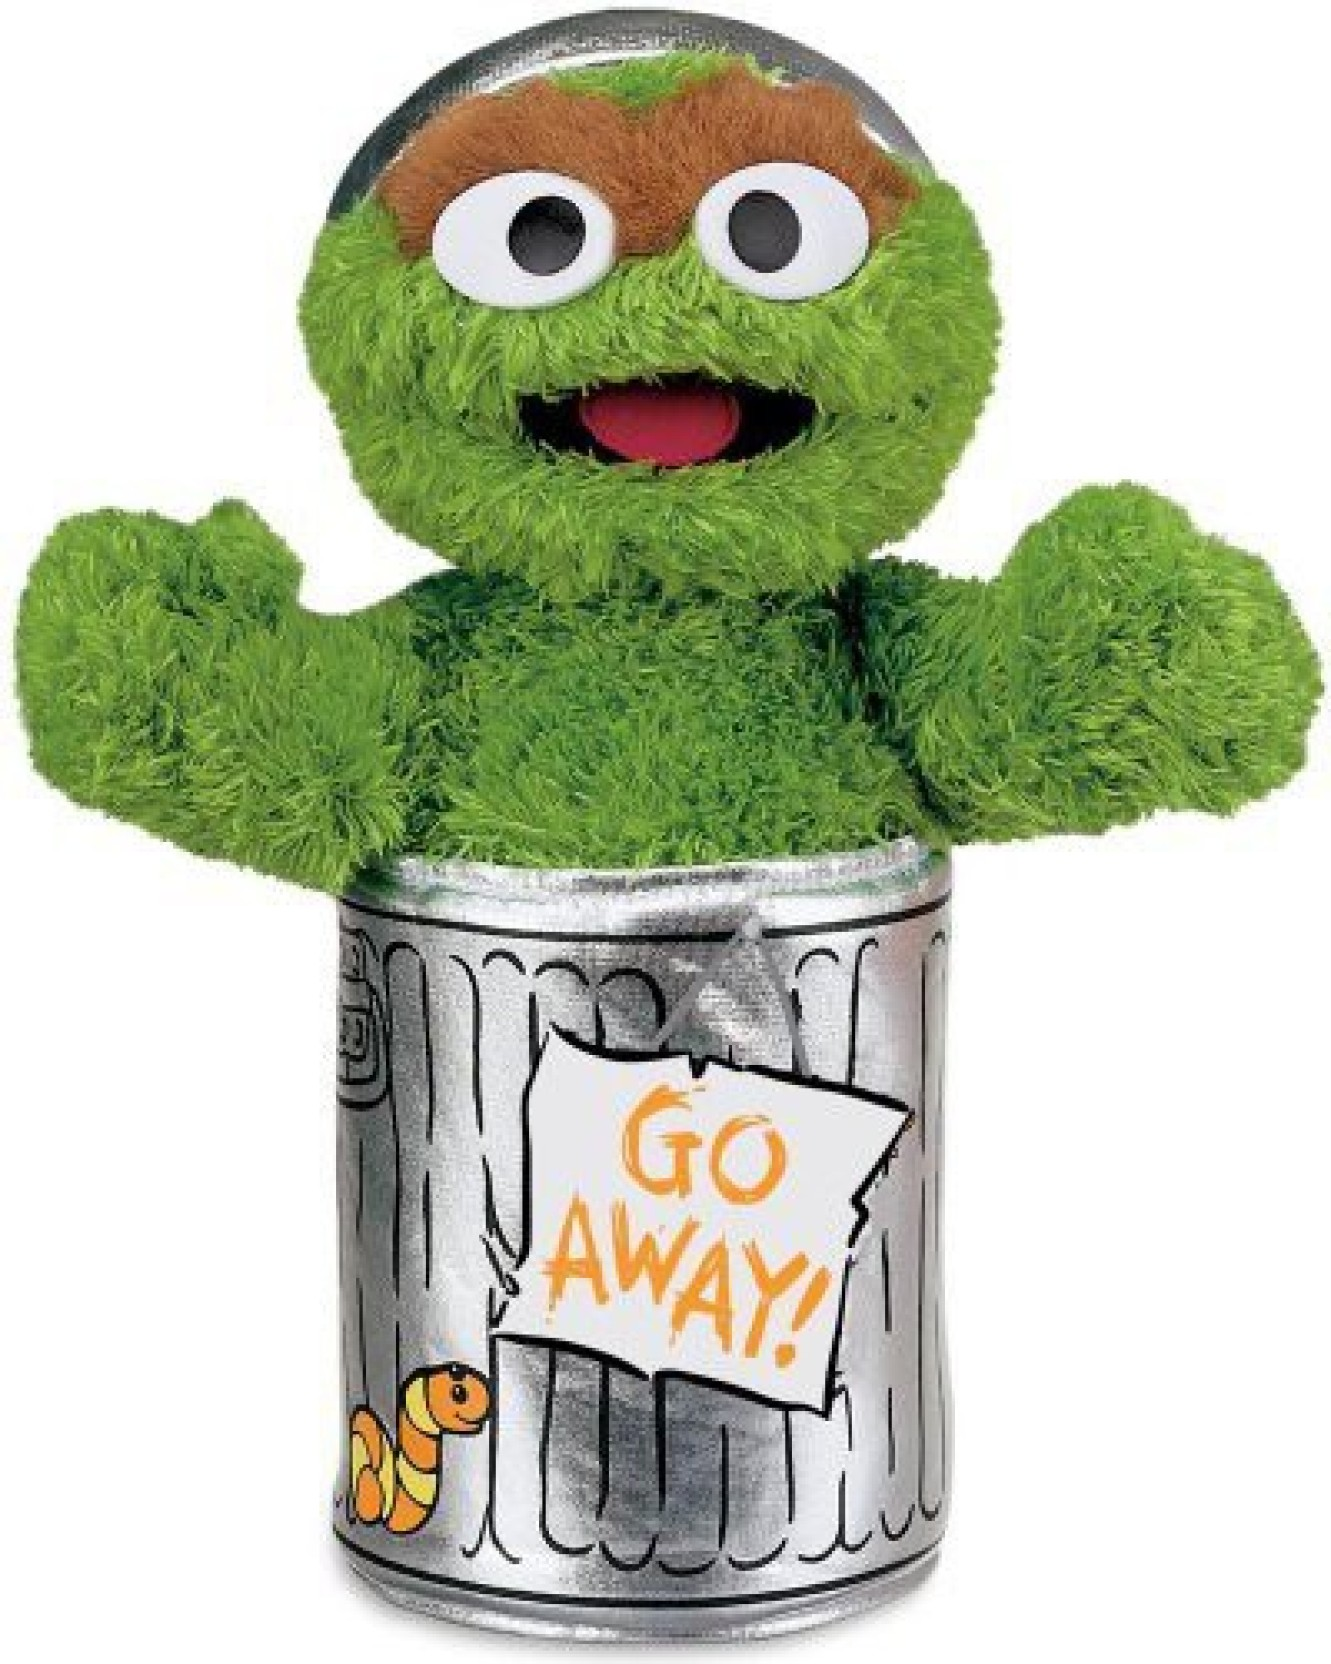 Gund Sesame Street Oscar The Grouch Stuffed Animal 25 Inch